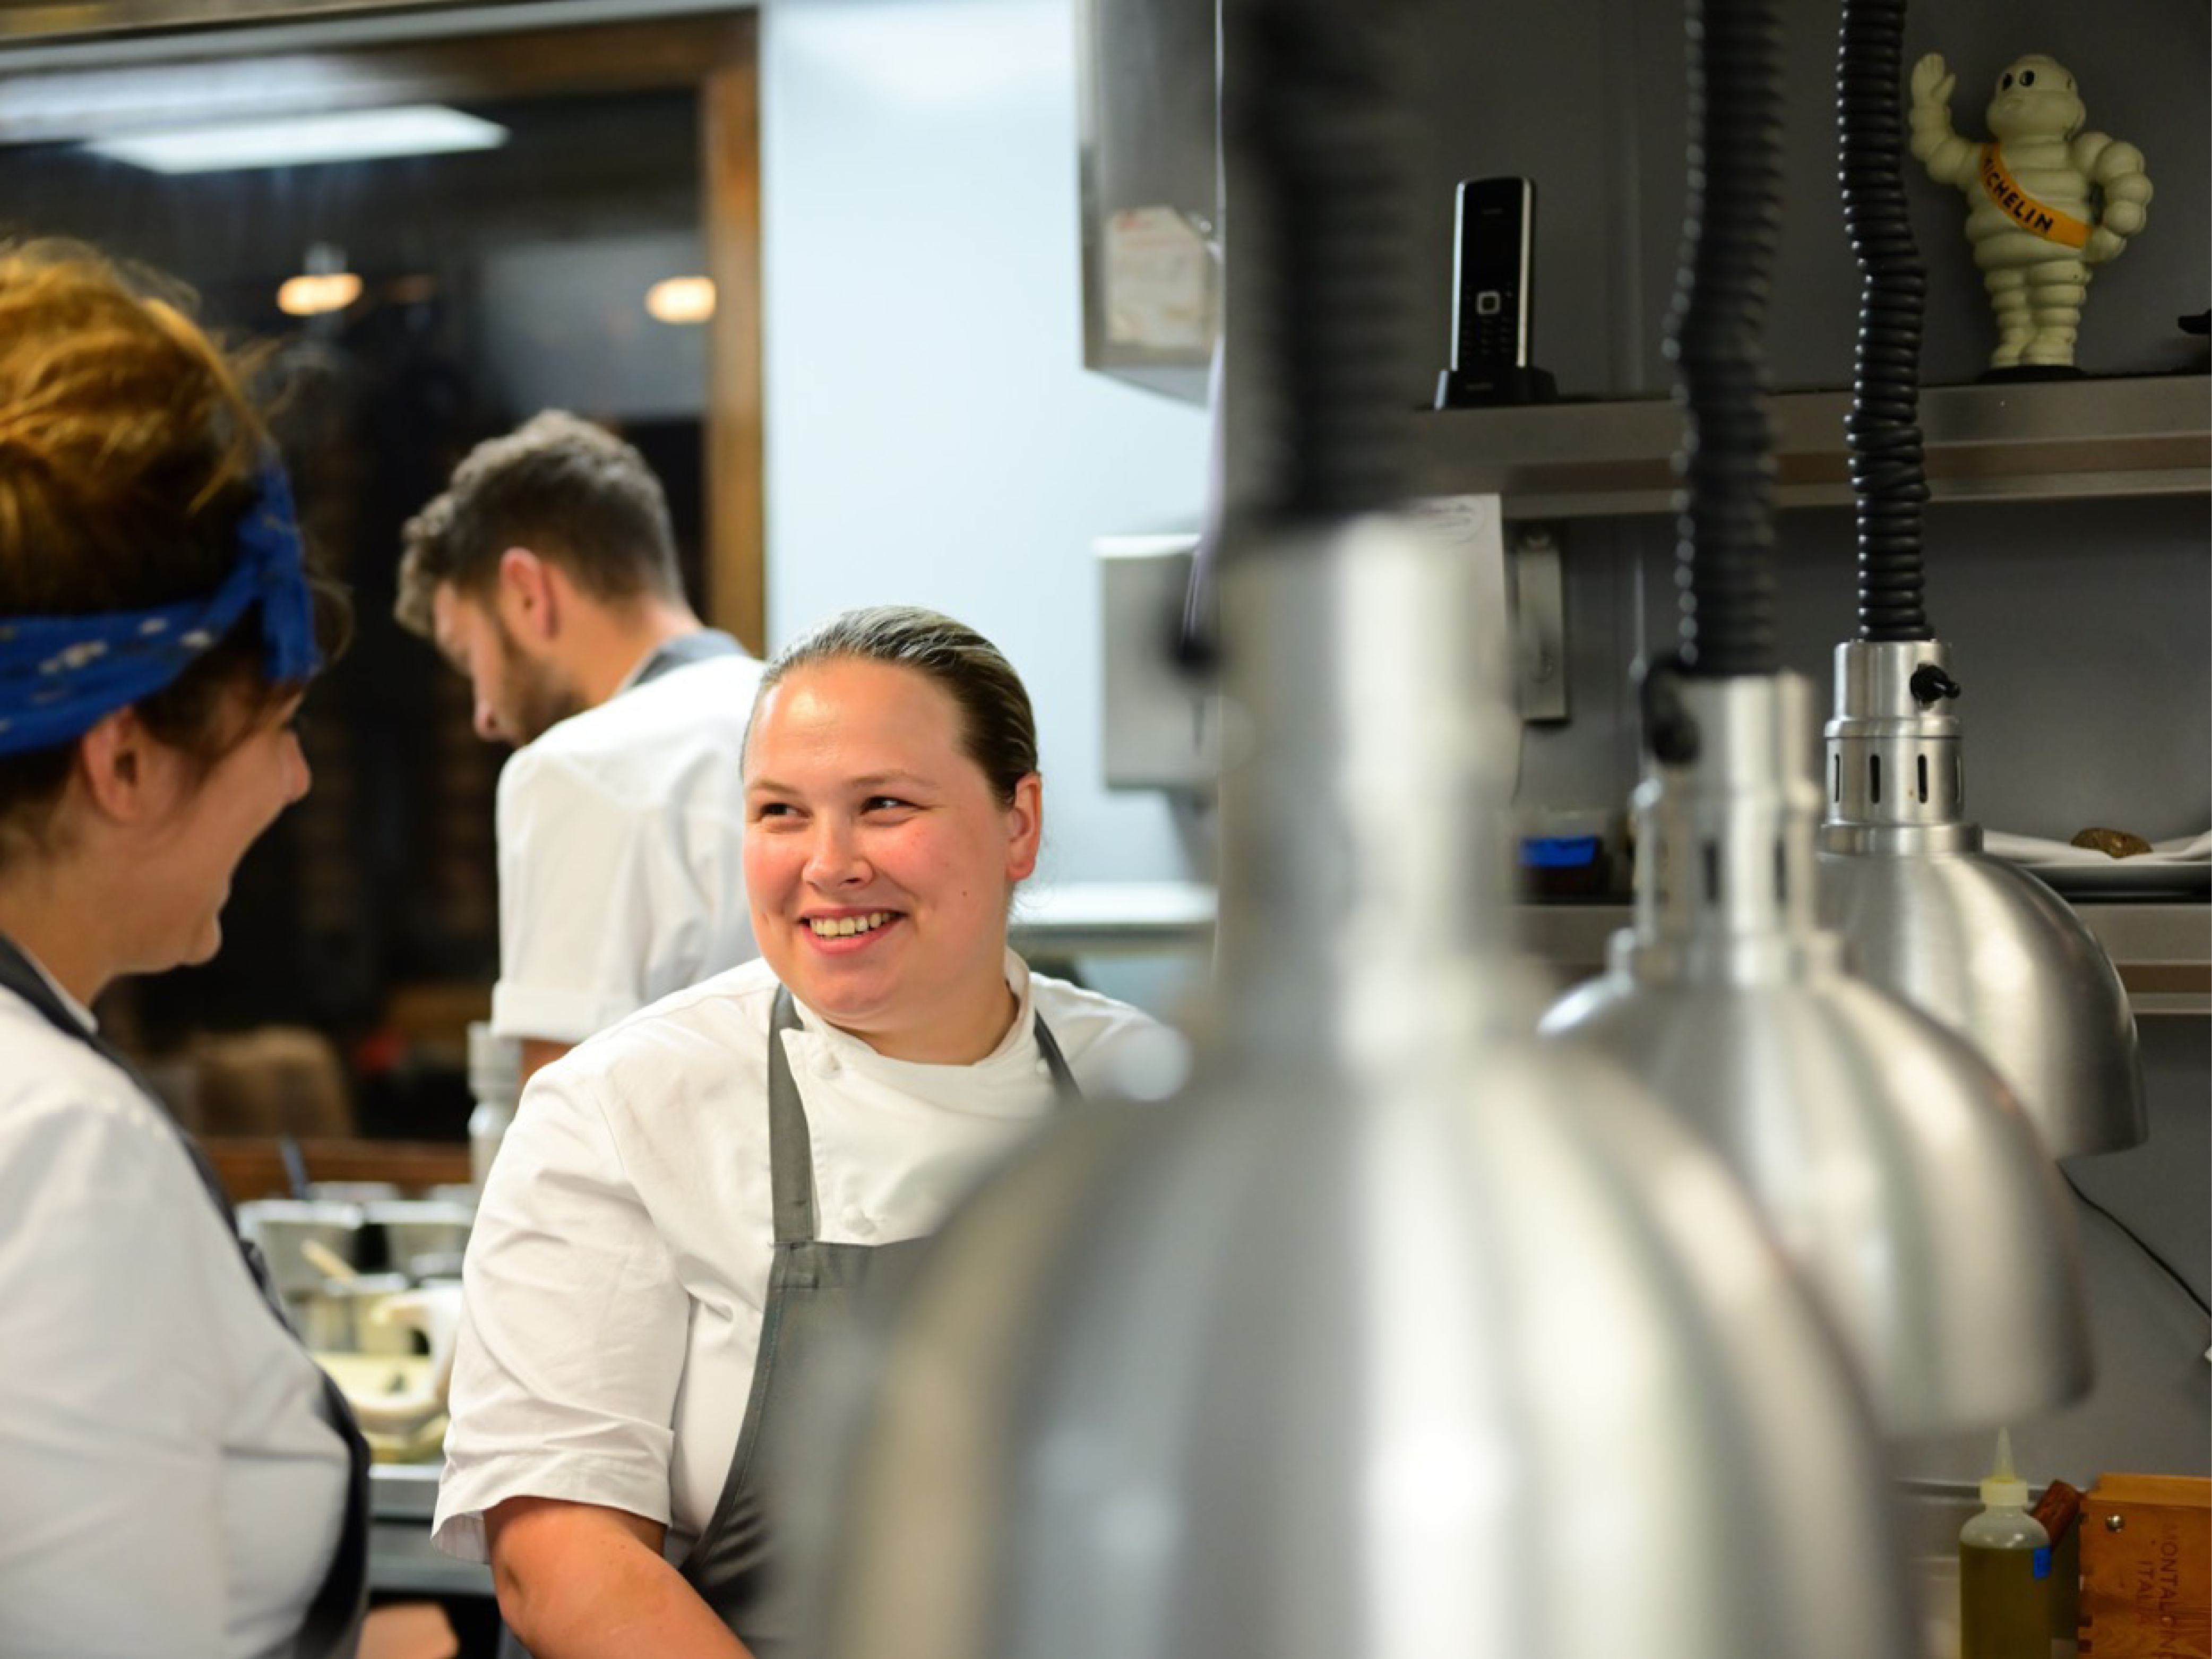 Emily Brightman, head chef of Murano